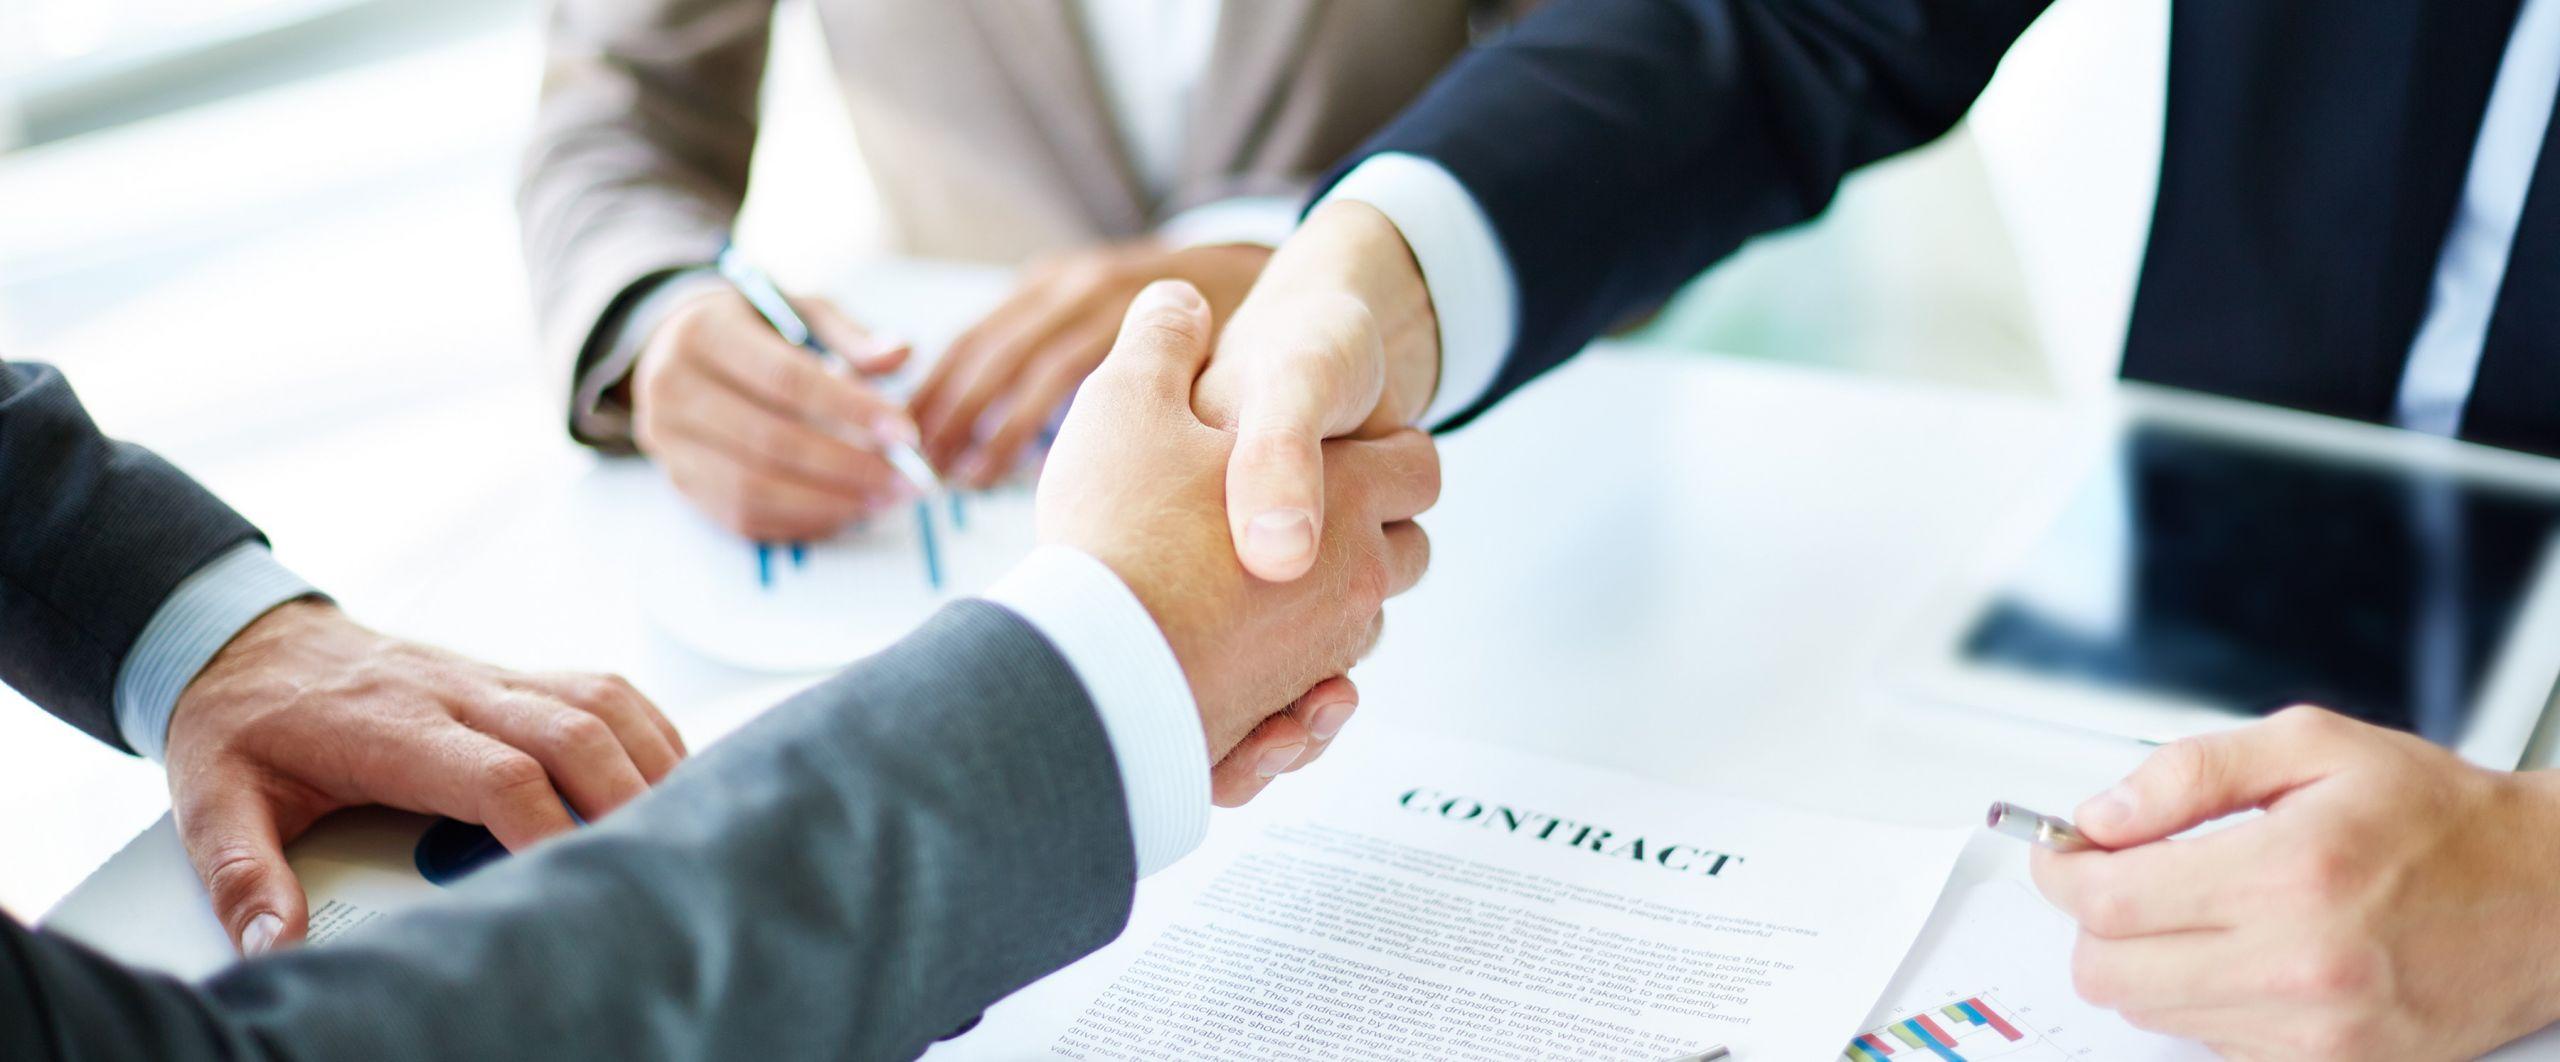 Making agreement 2